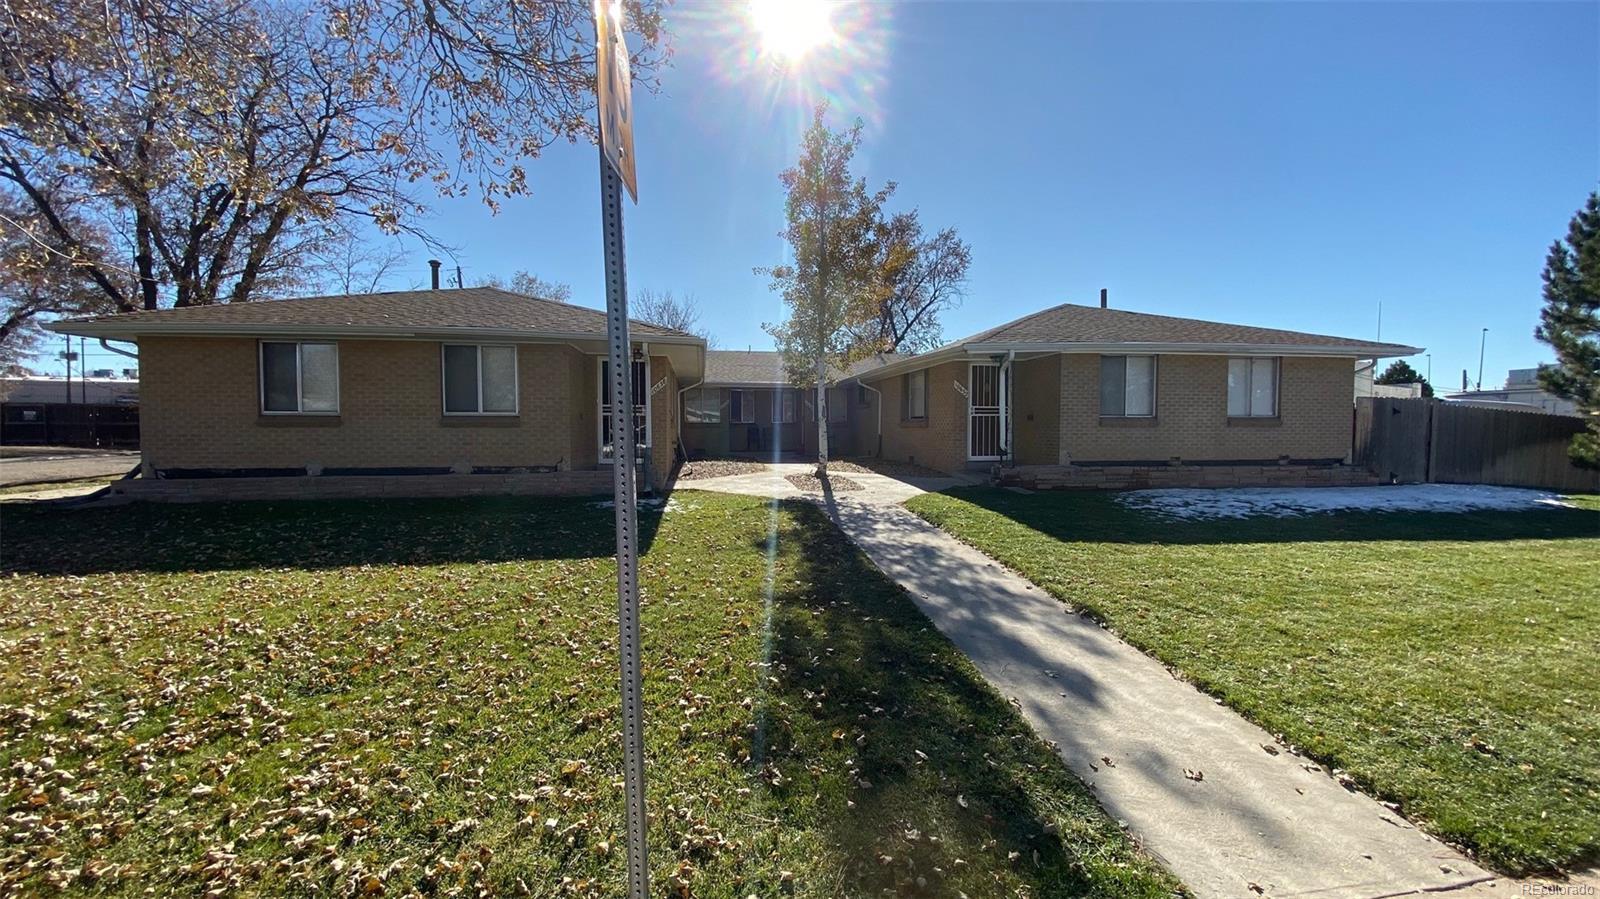 10632 E 4th Way, Aurora, CO 80010 - Aurora, CO real estate listing